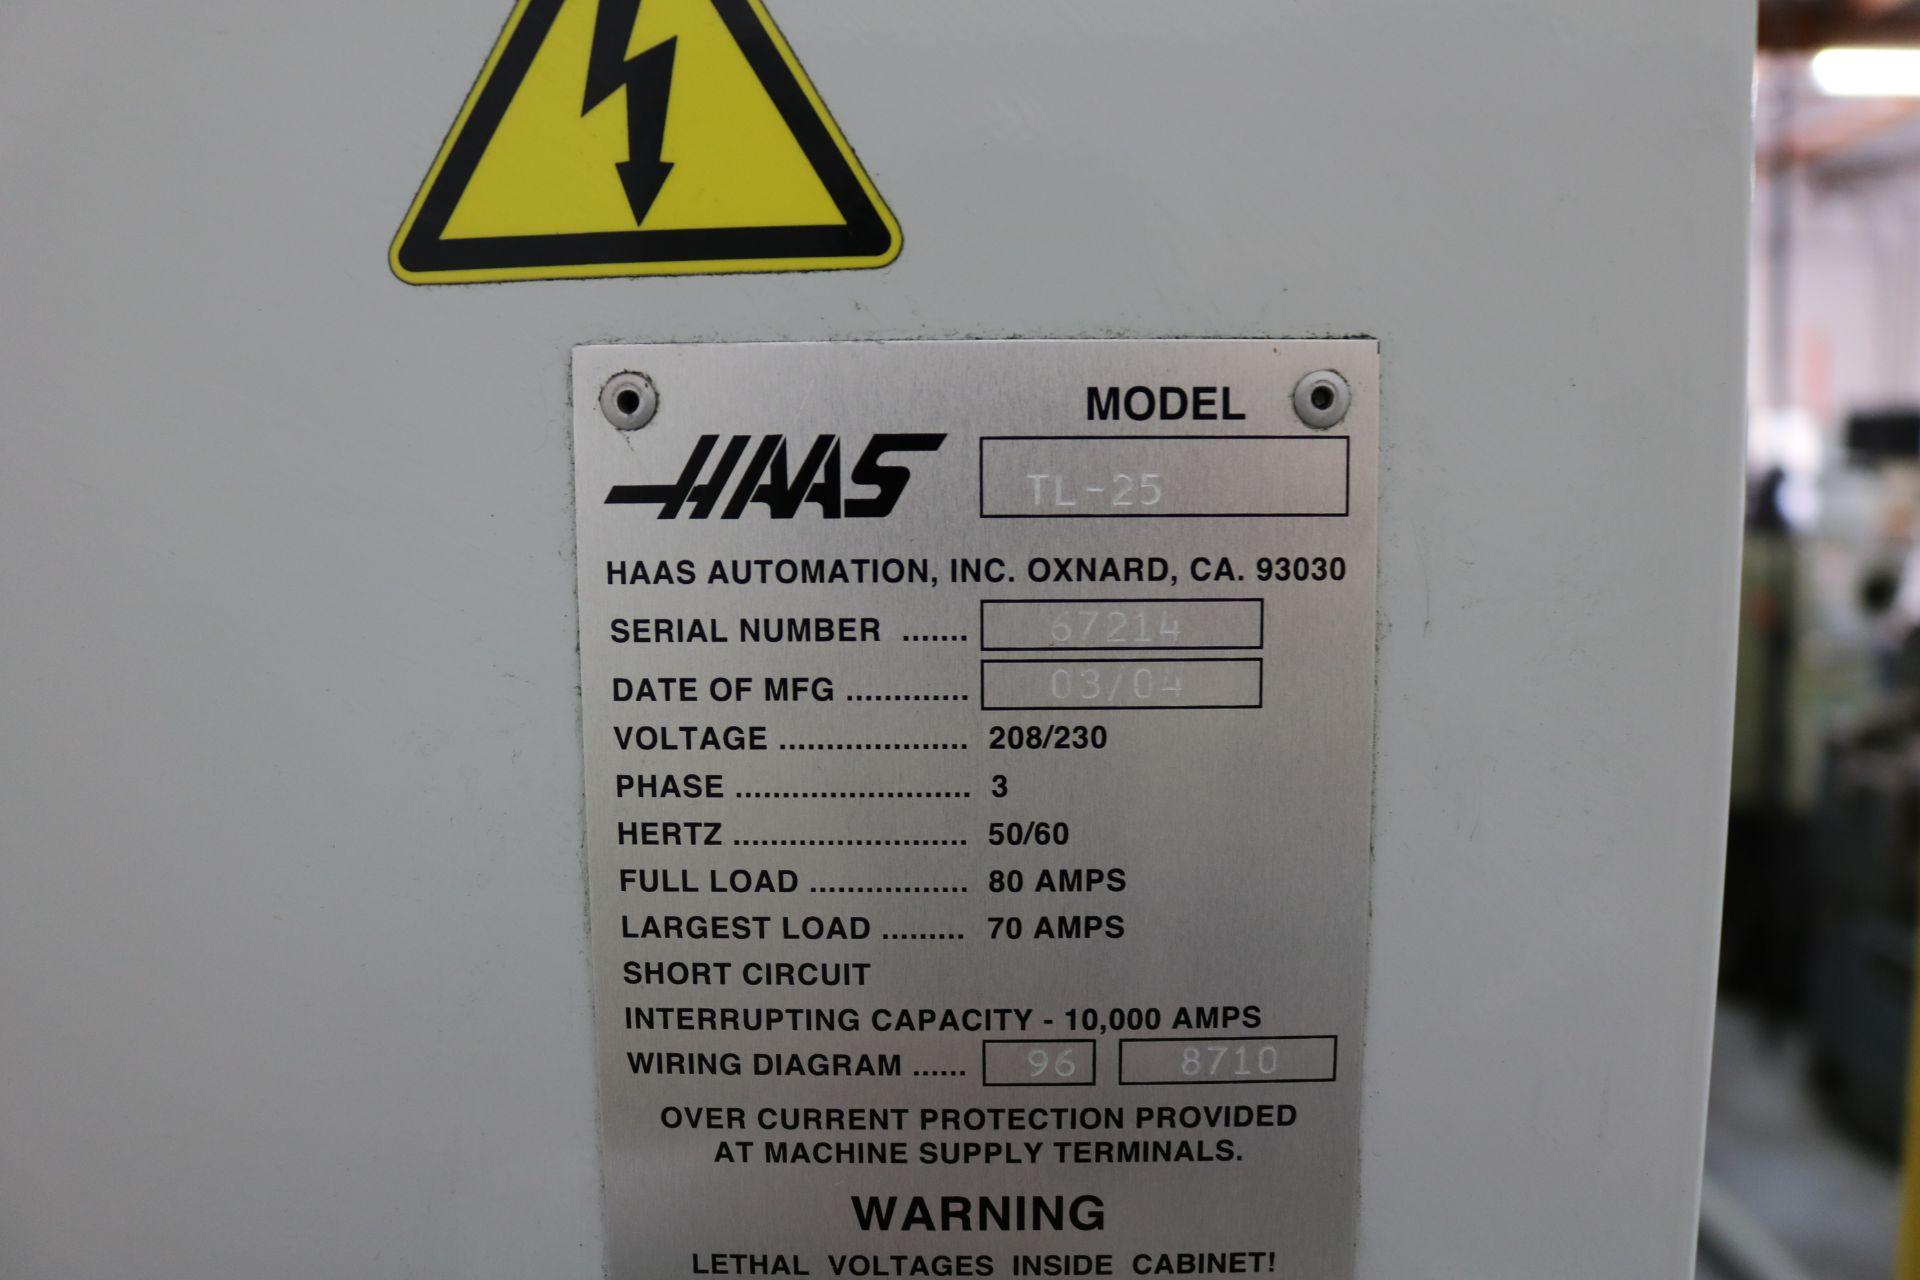 "Lot 17 - 2004 HAAS TL-25 CNC TURNING CENTER, 10"" 3 JAW CHUCK, 30"" SWING, 14.5"" SWING OVER CROSS SLIDE, 4"" BAR"